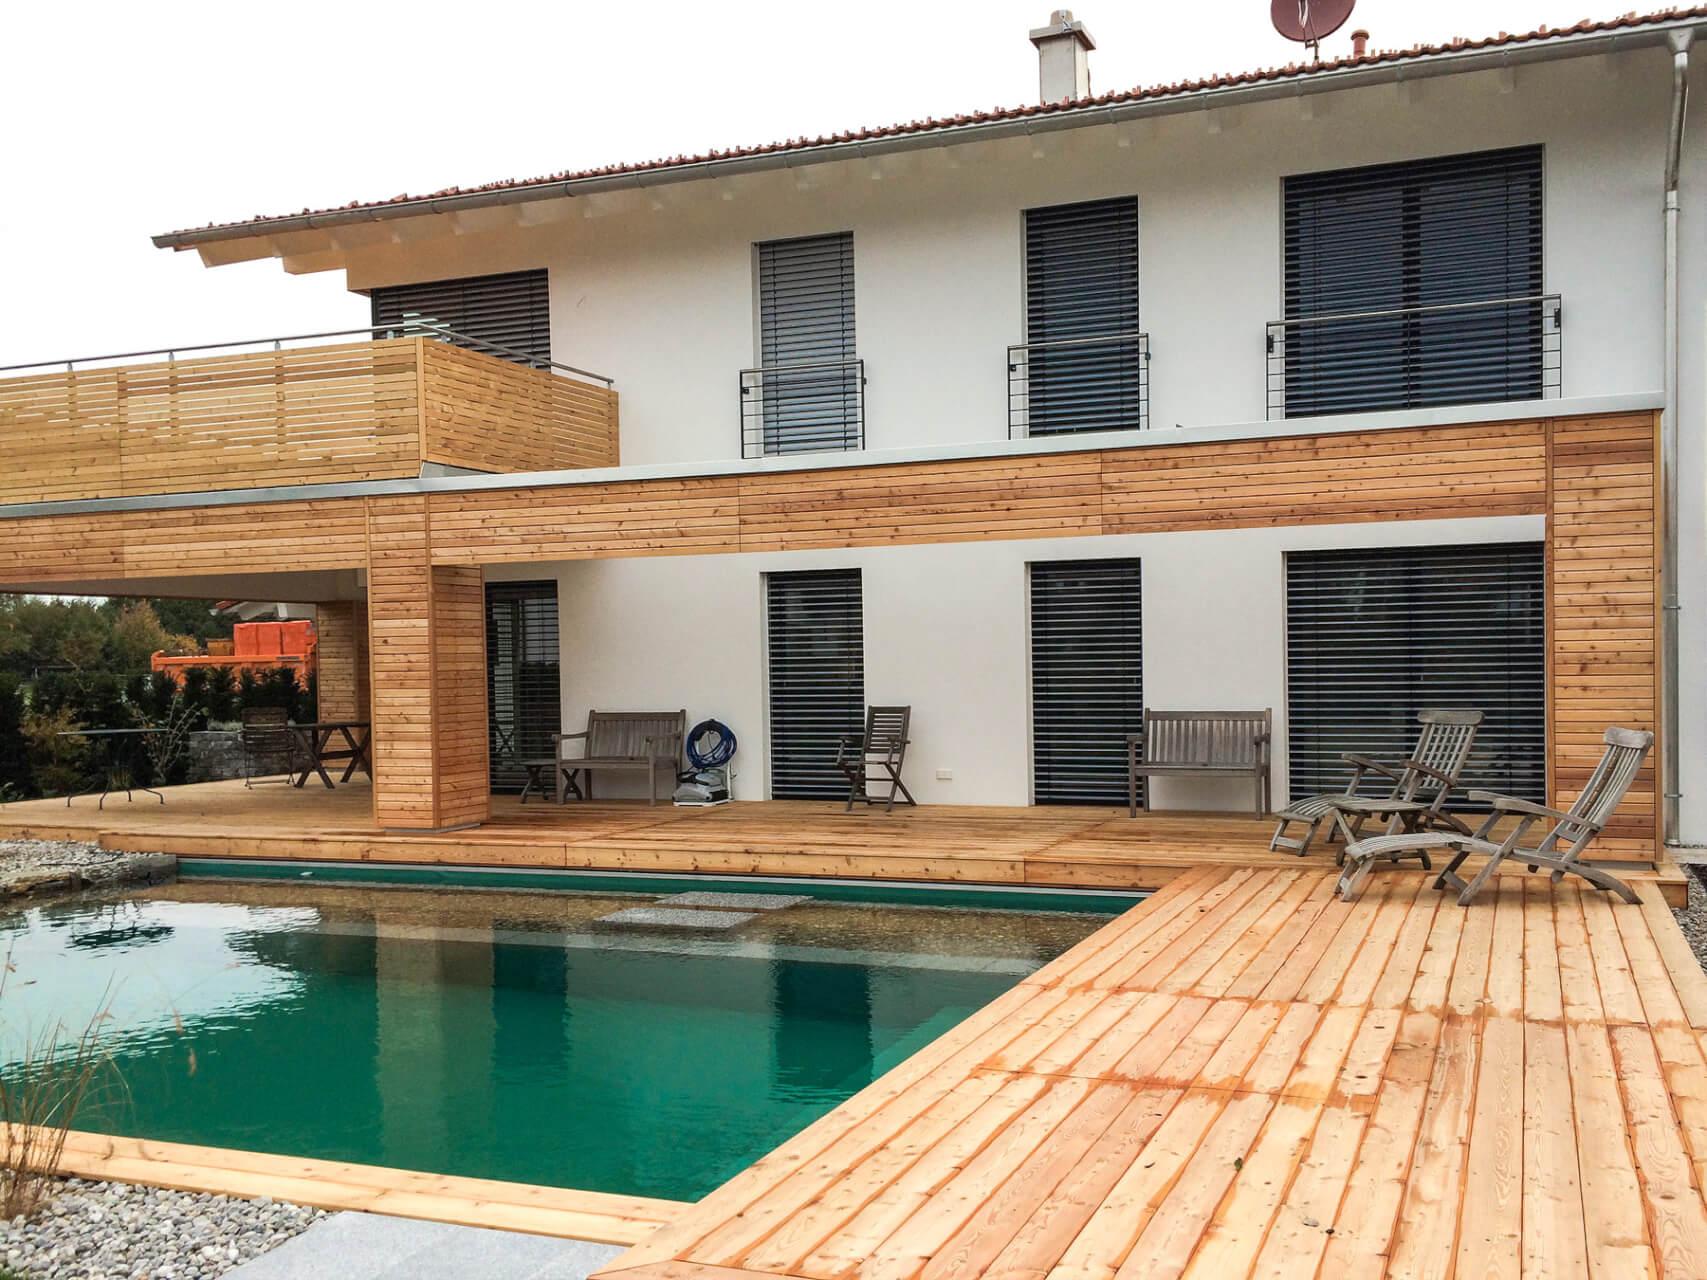 Holzbau Balkon Terrasse Pool – Holzbau Wernberger Traunstein